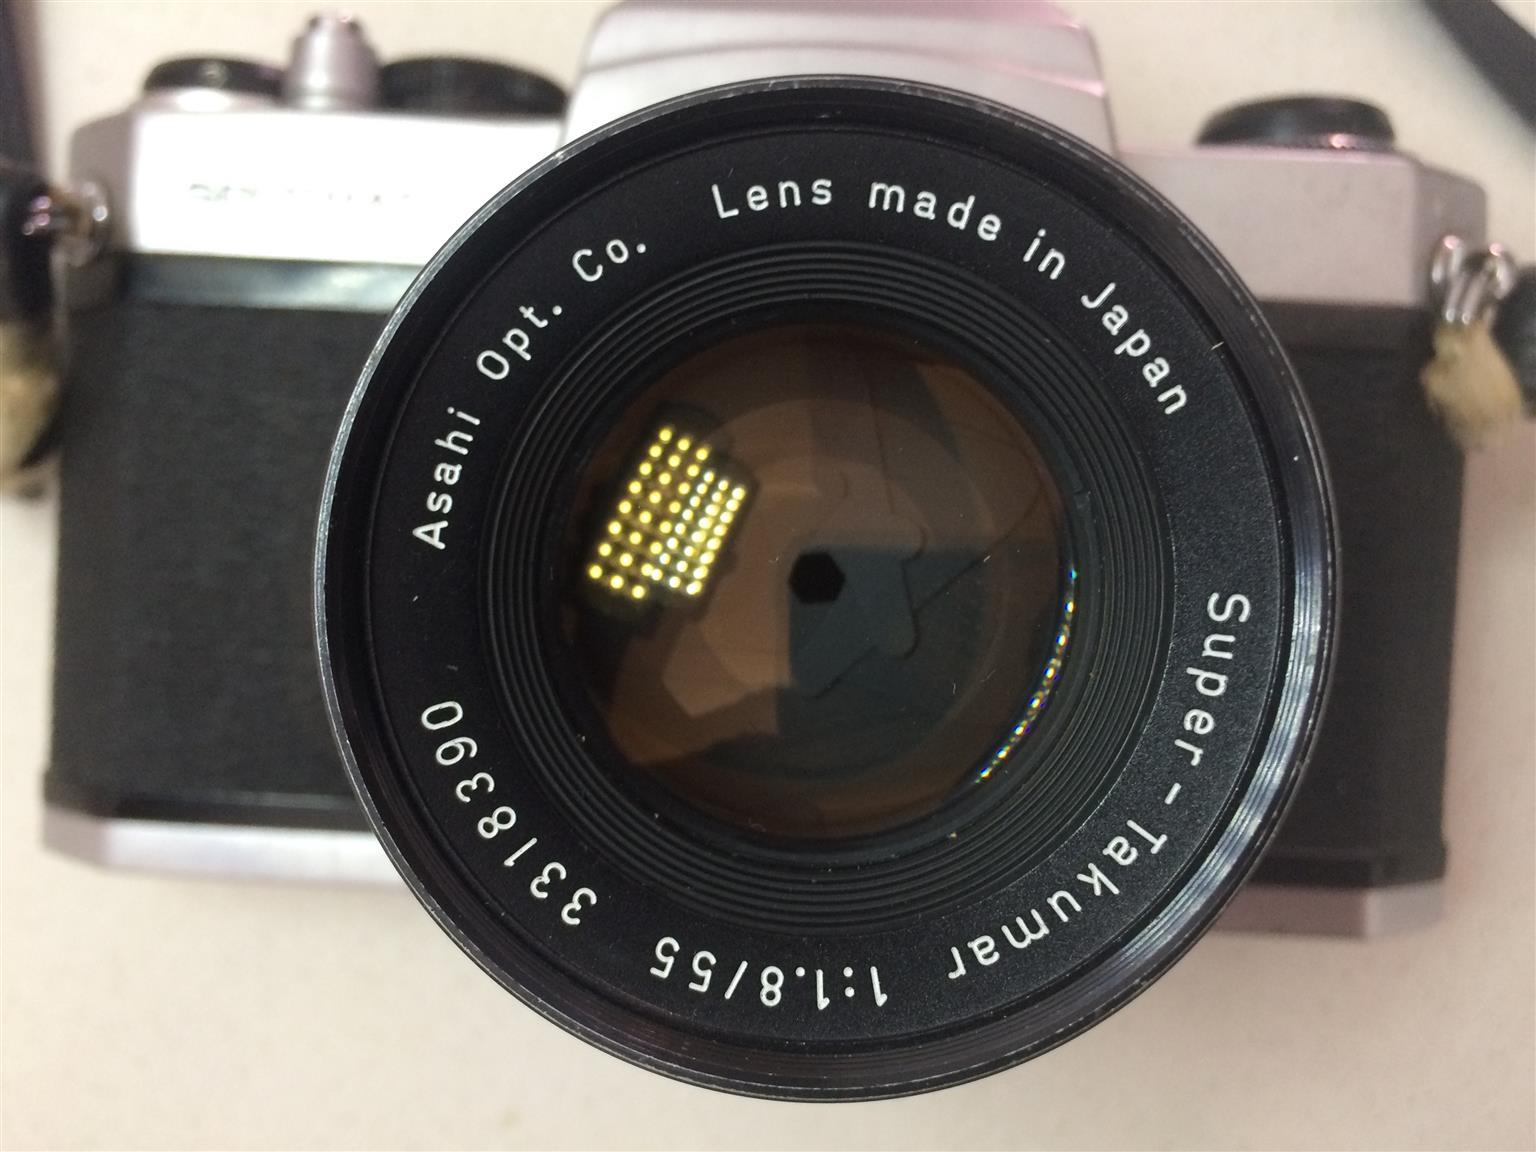 Pentax Spotmatic Vintage Film Camera